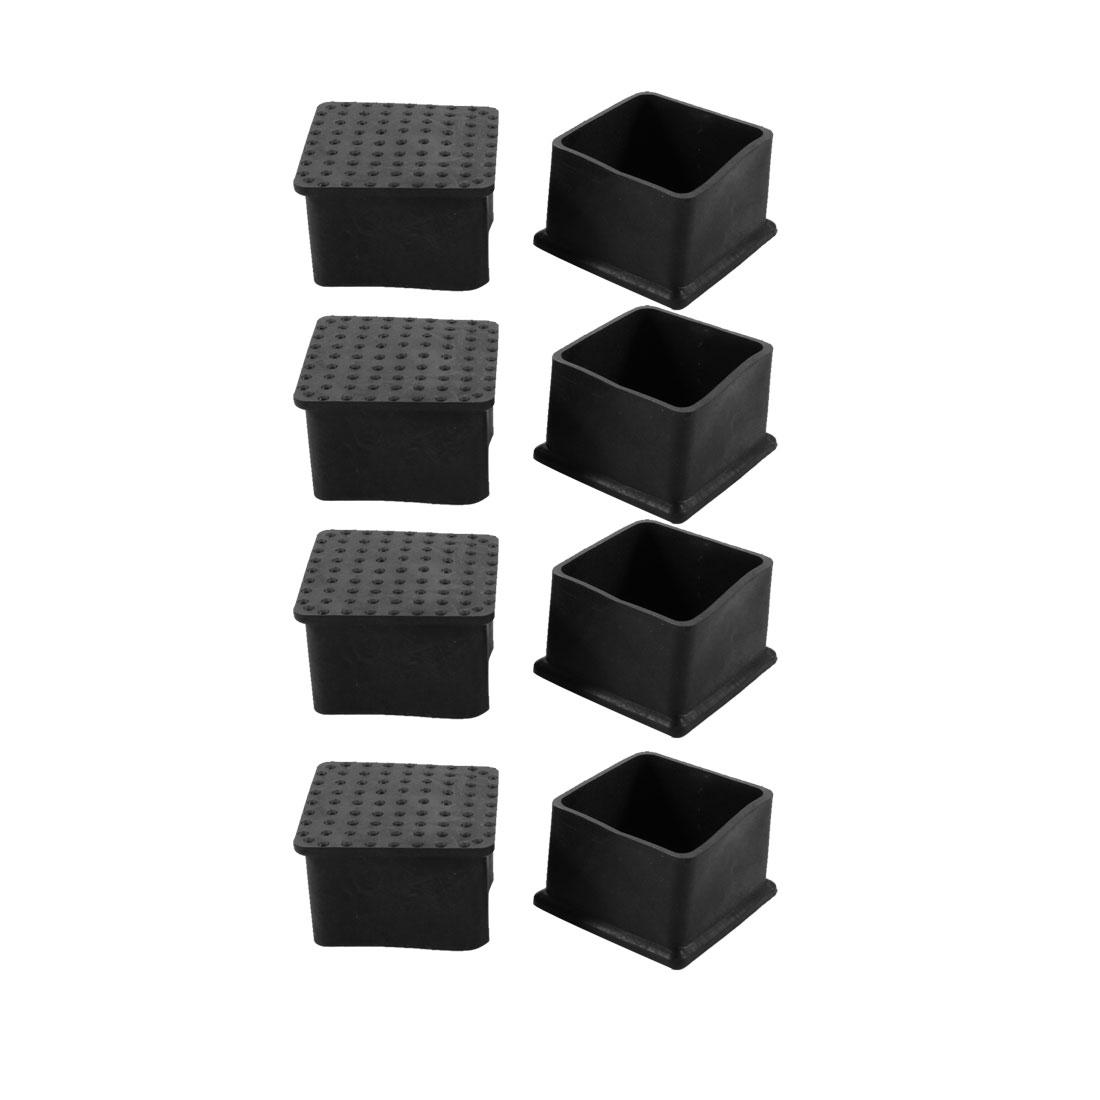 8pcs 44x44mm Black PVC Rubber Square Chair Leg Insert Floor Cover Protector